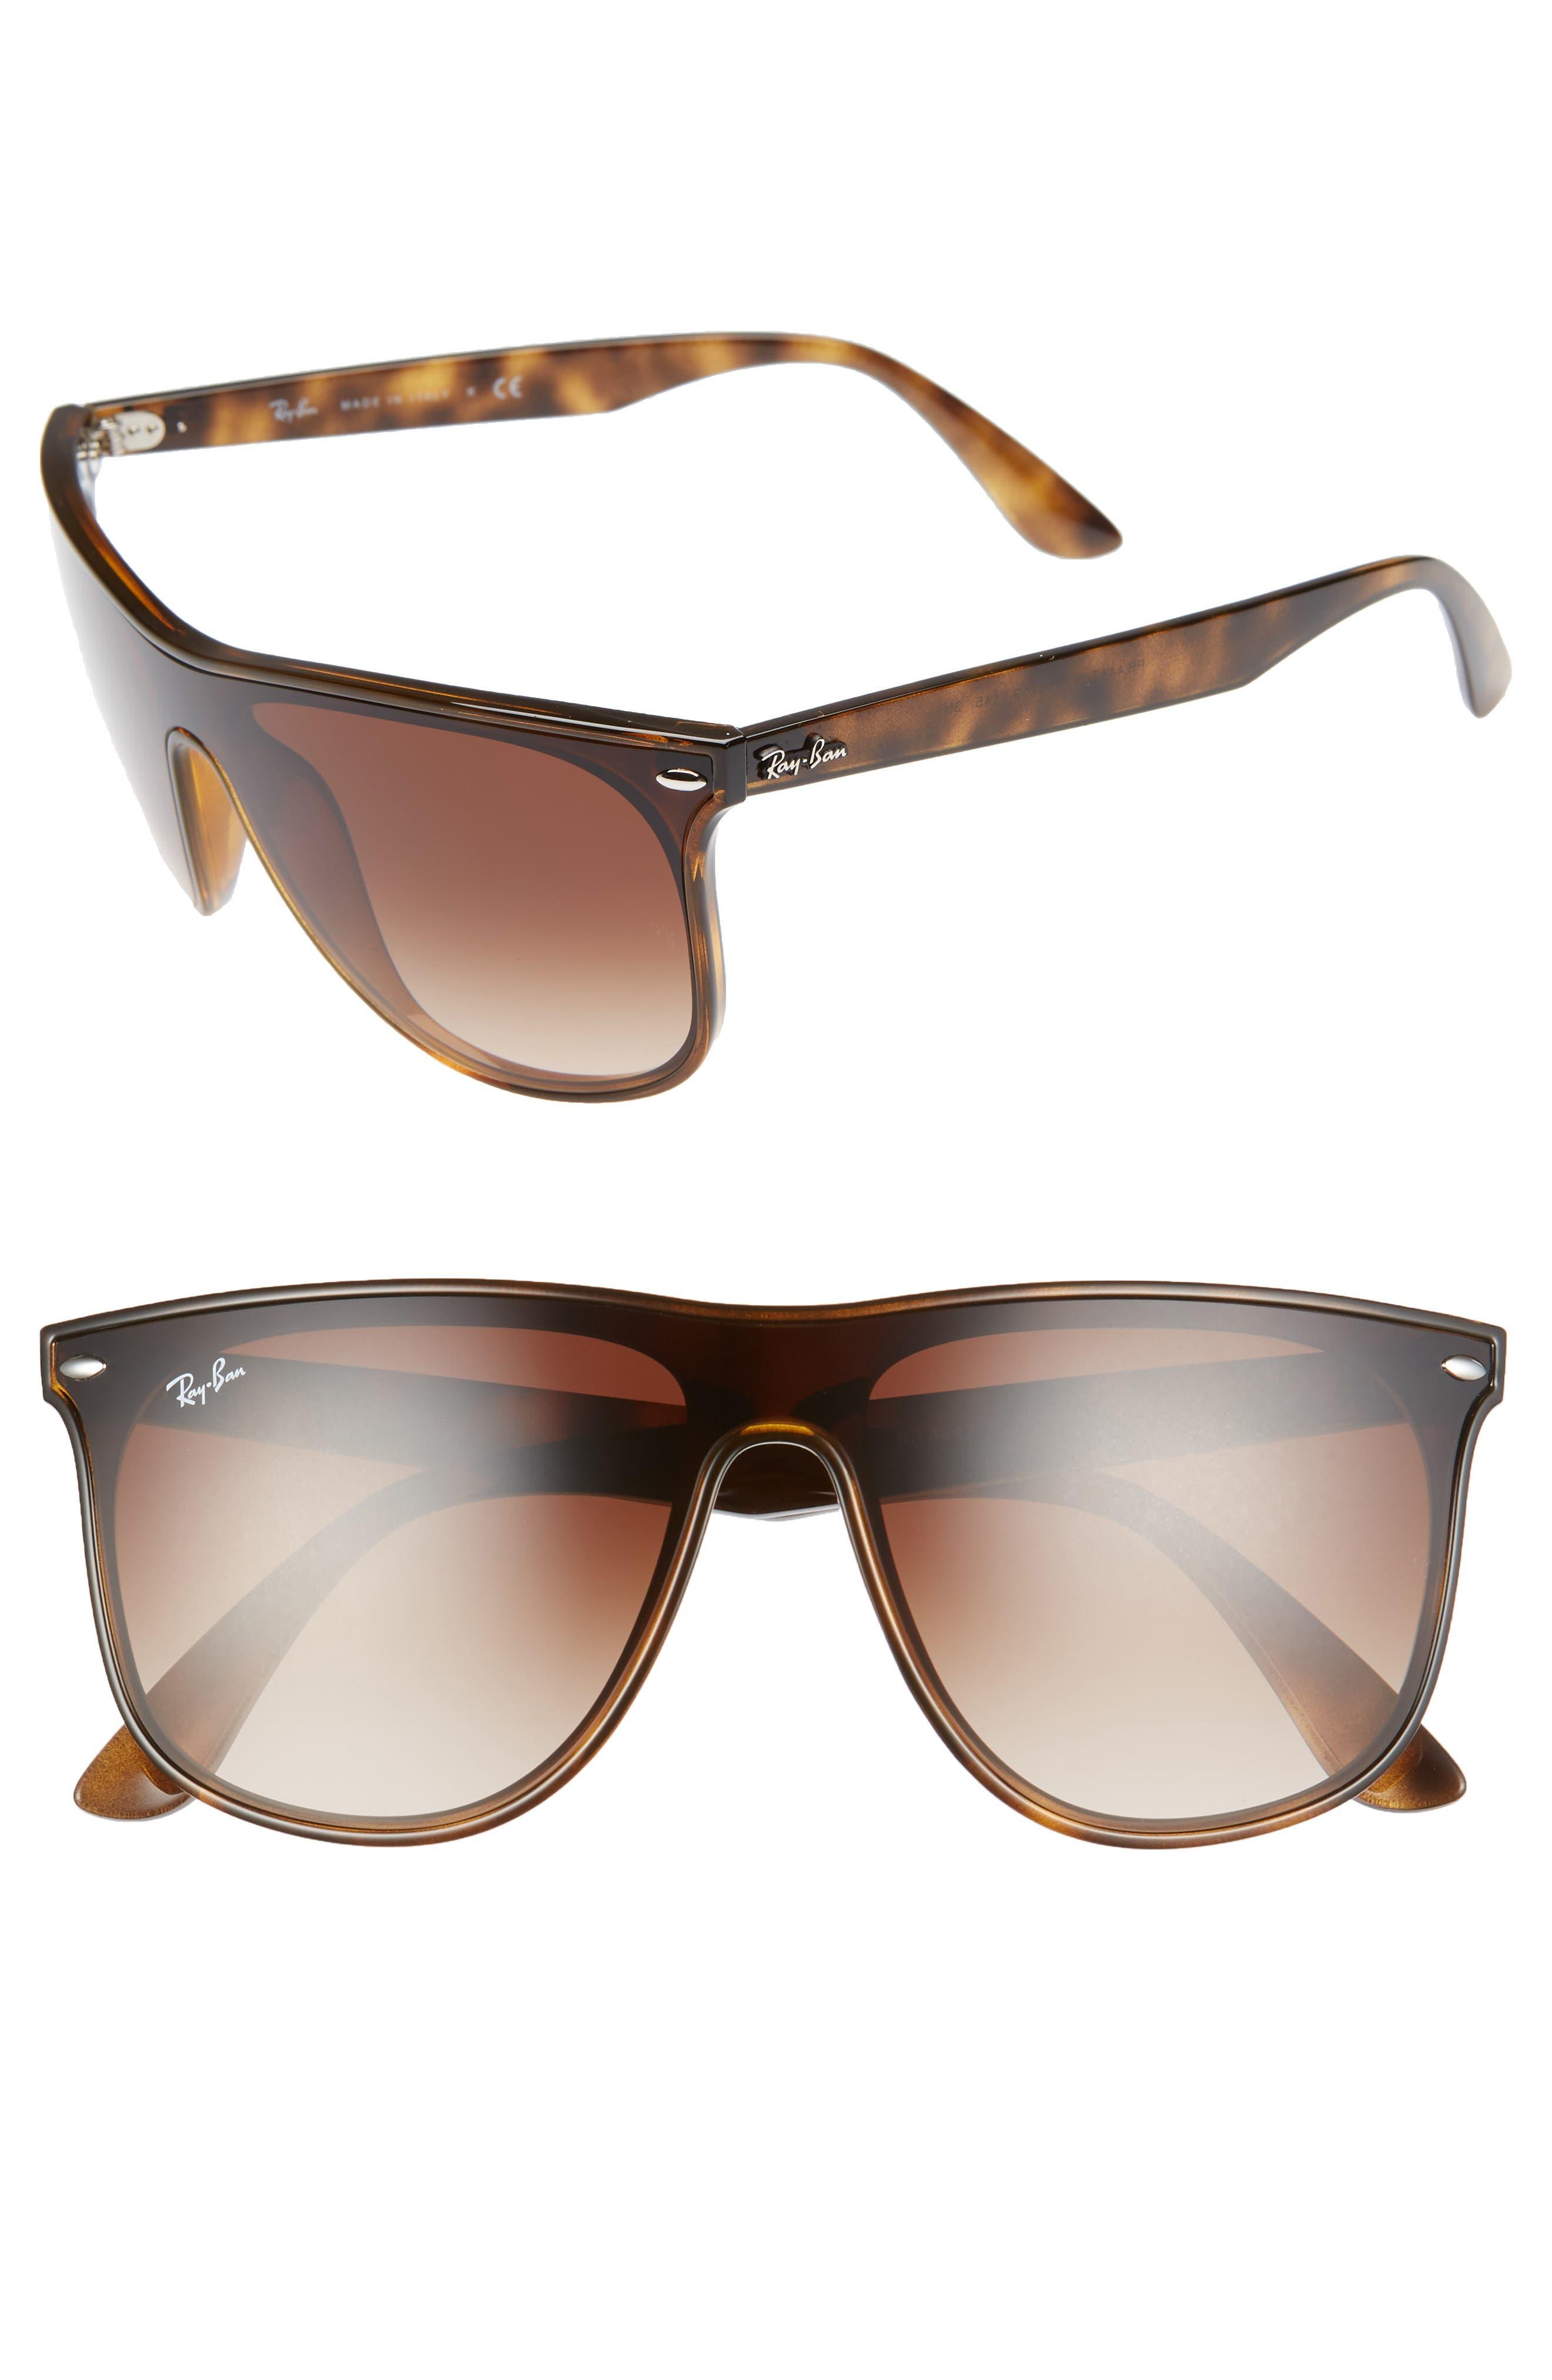 Ray-Ban 14m Shield Sunglasses - Havana Gradient